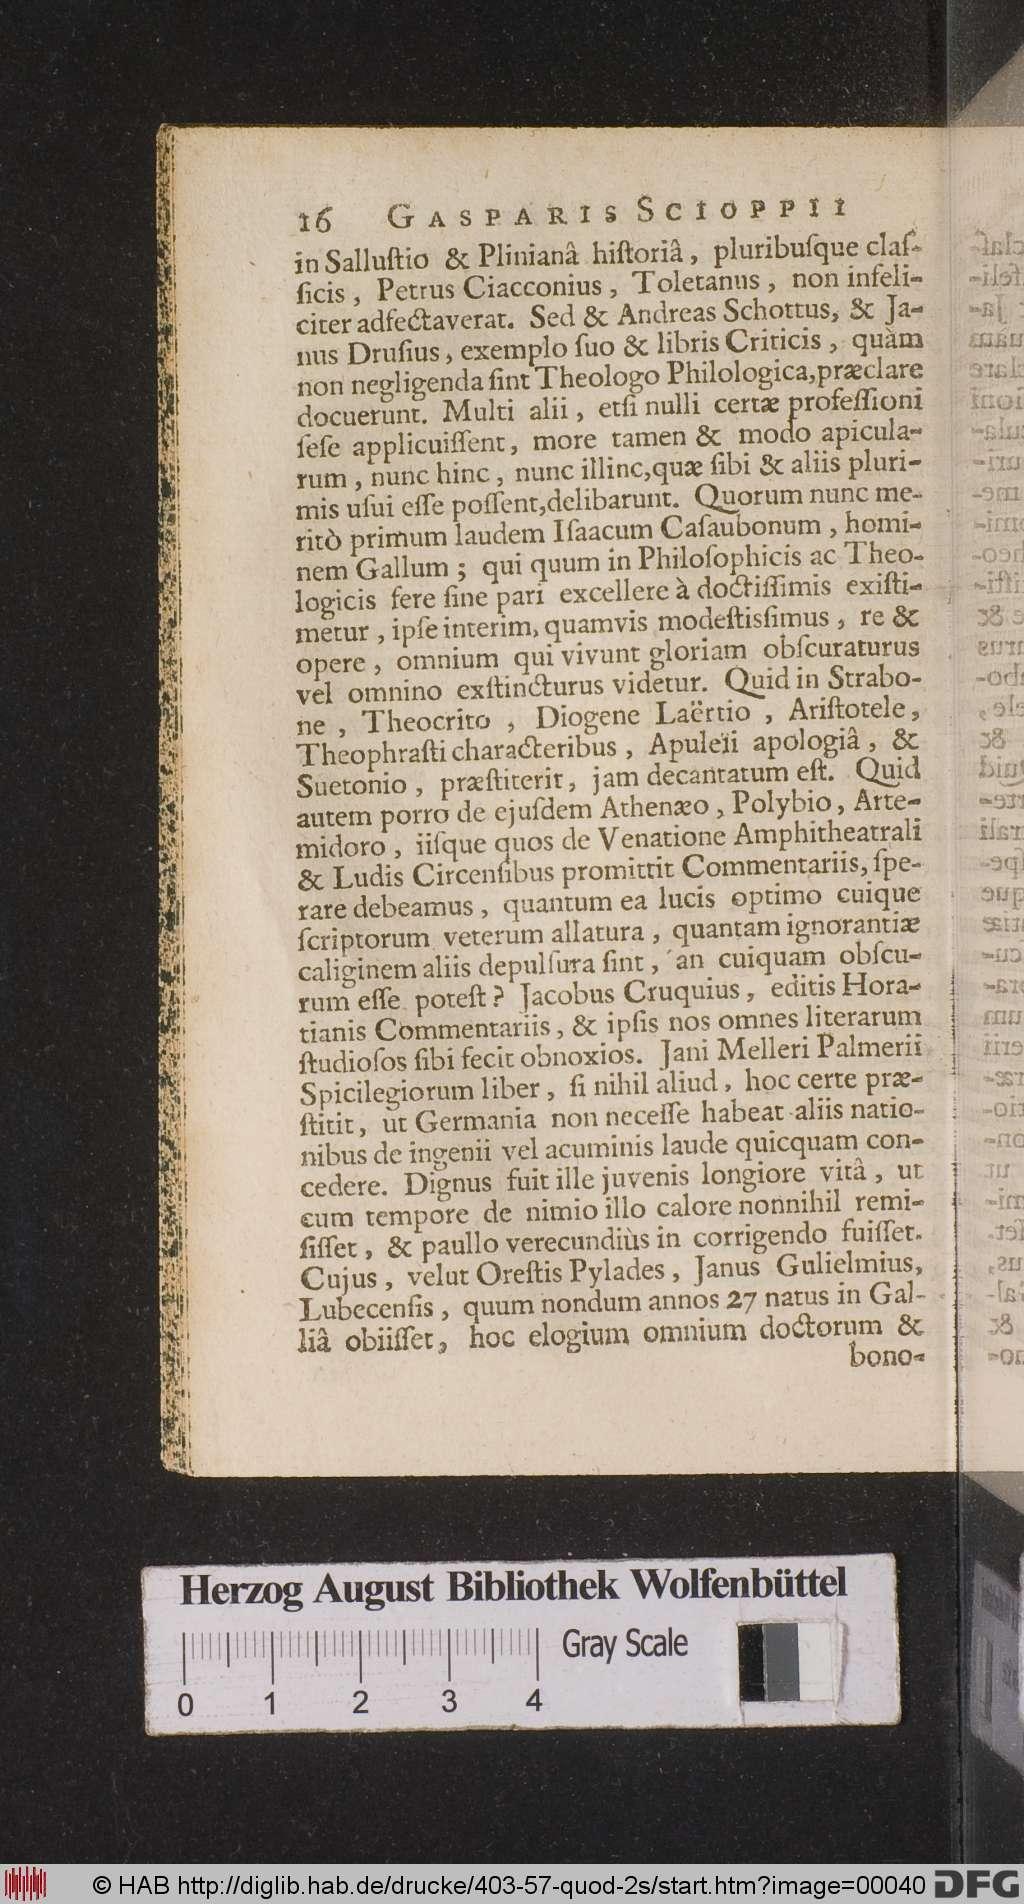 http://diglib.hab.de/drucke/403-57-quod-2s/00040.jpg